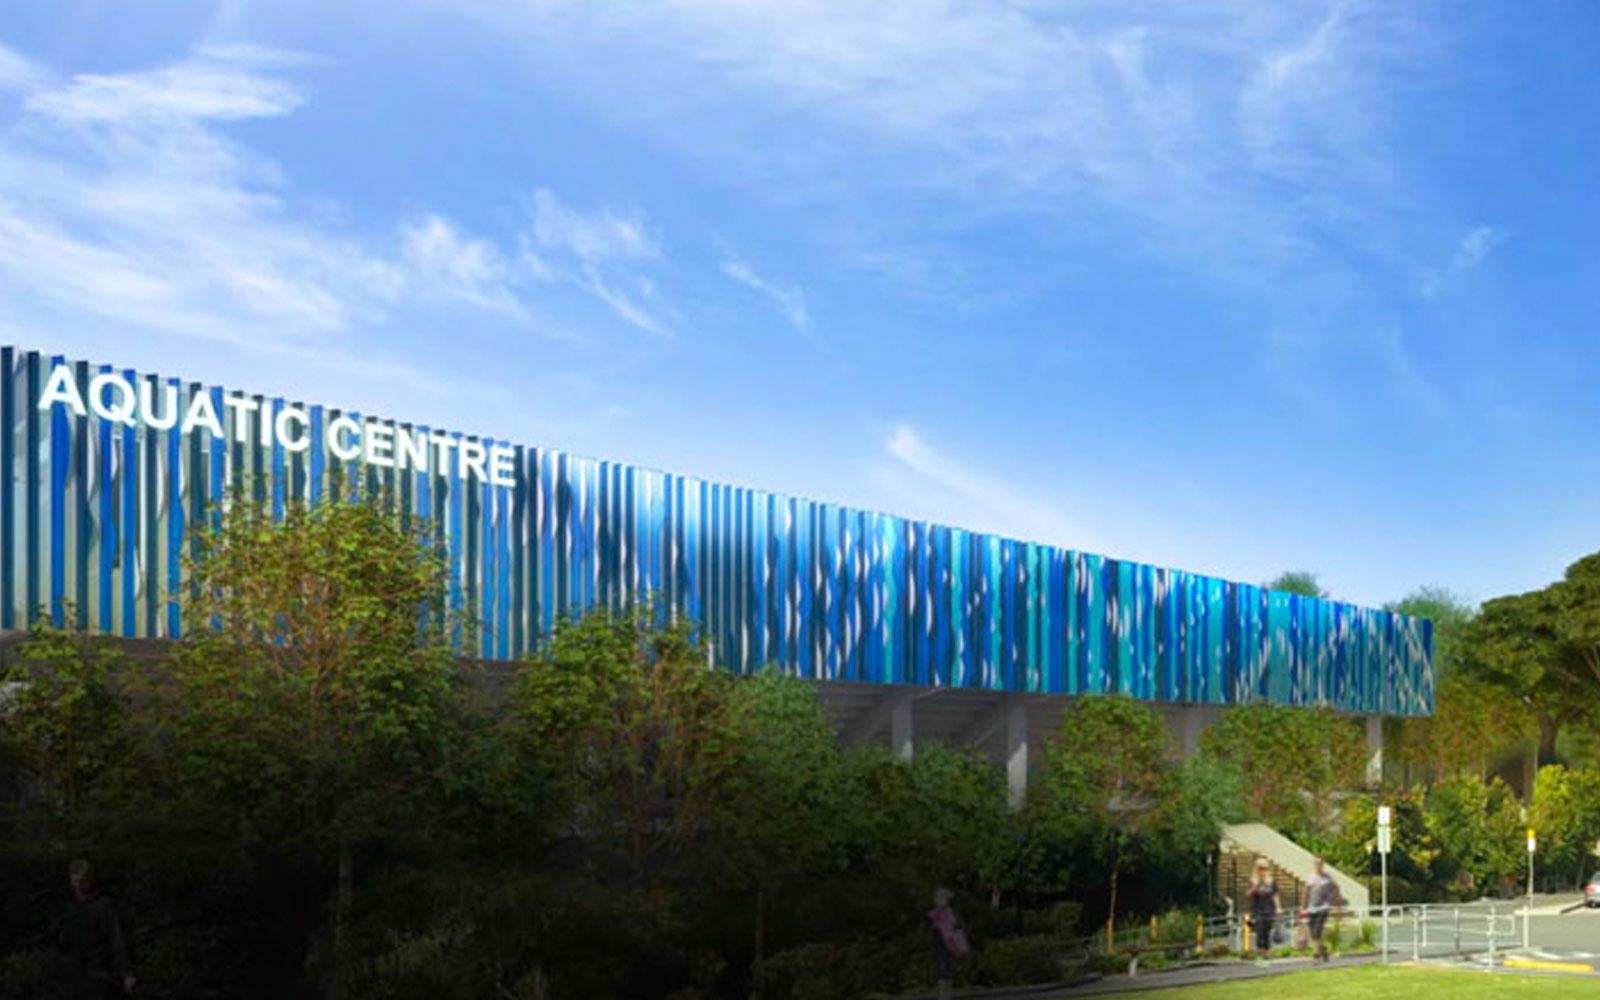 Brisbane Aquatic Centre Olympics Development